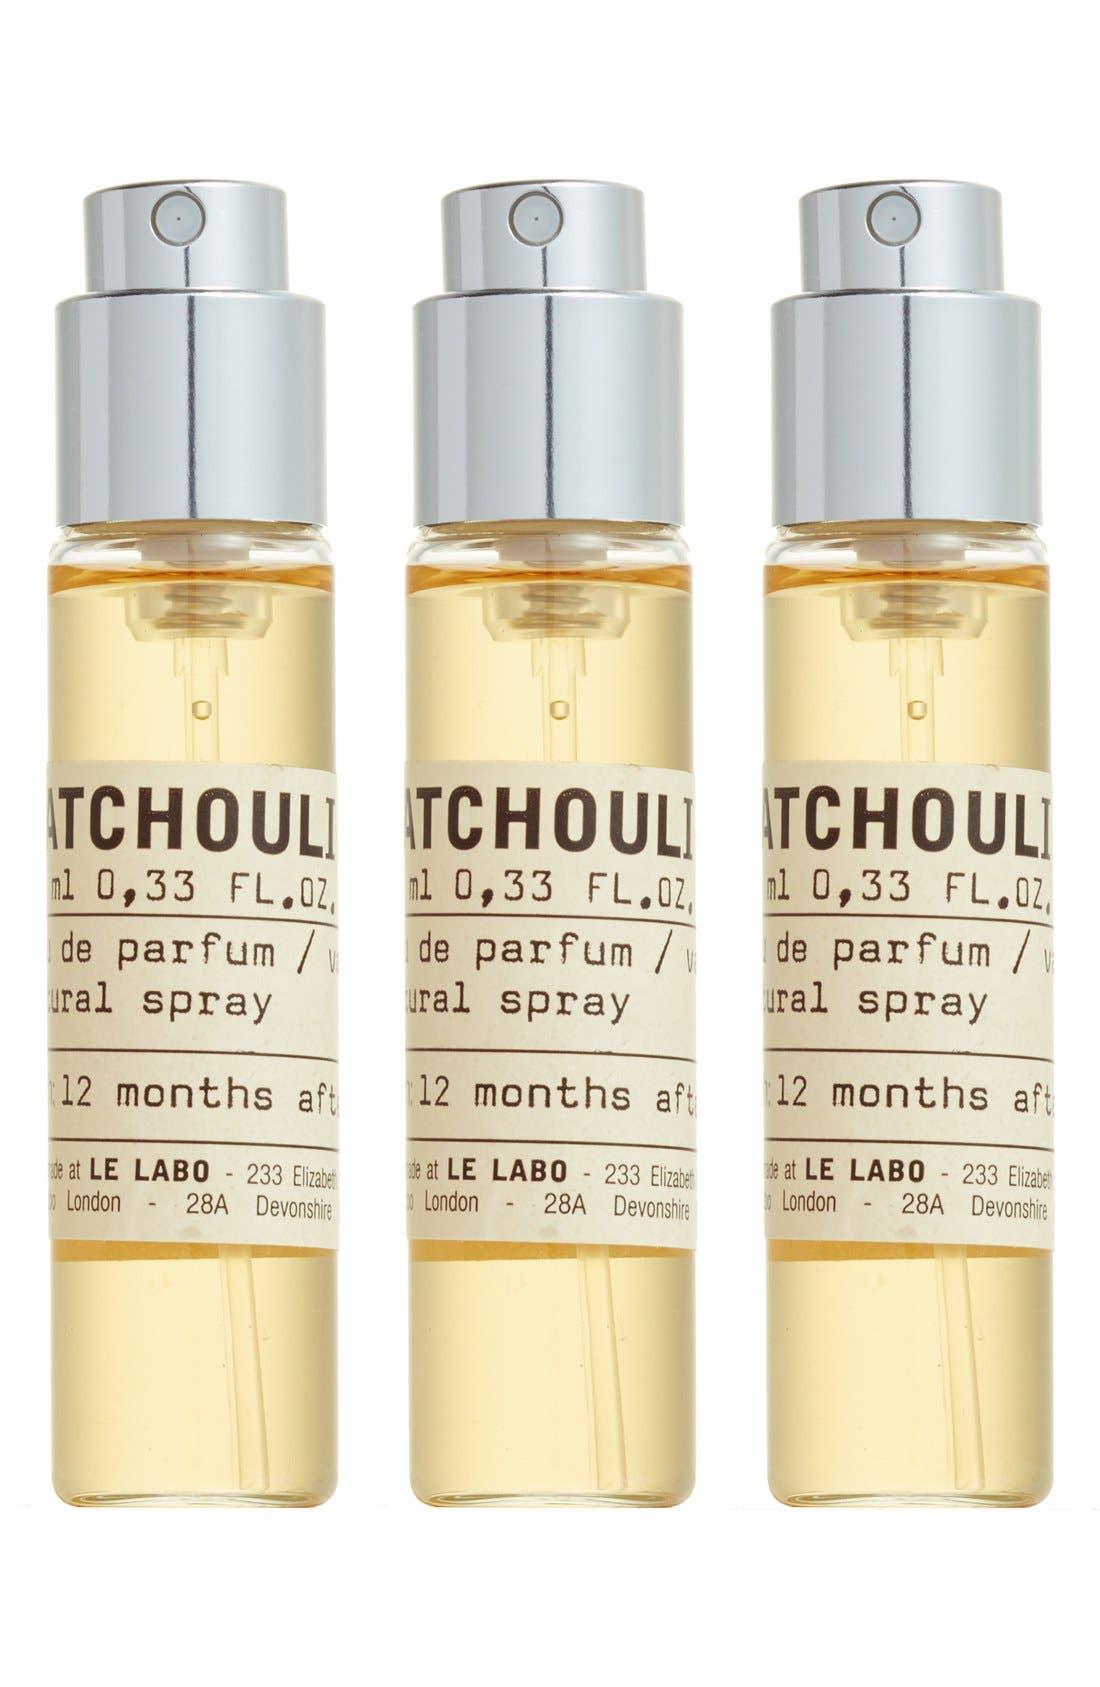 Le Labo 'Patchouli 24' Travel Tube Refill